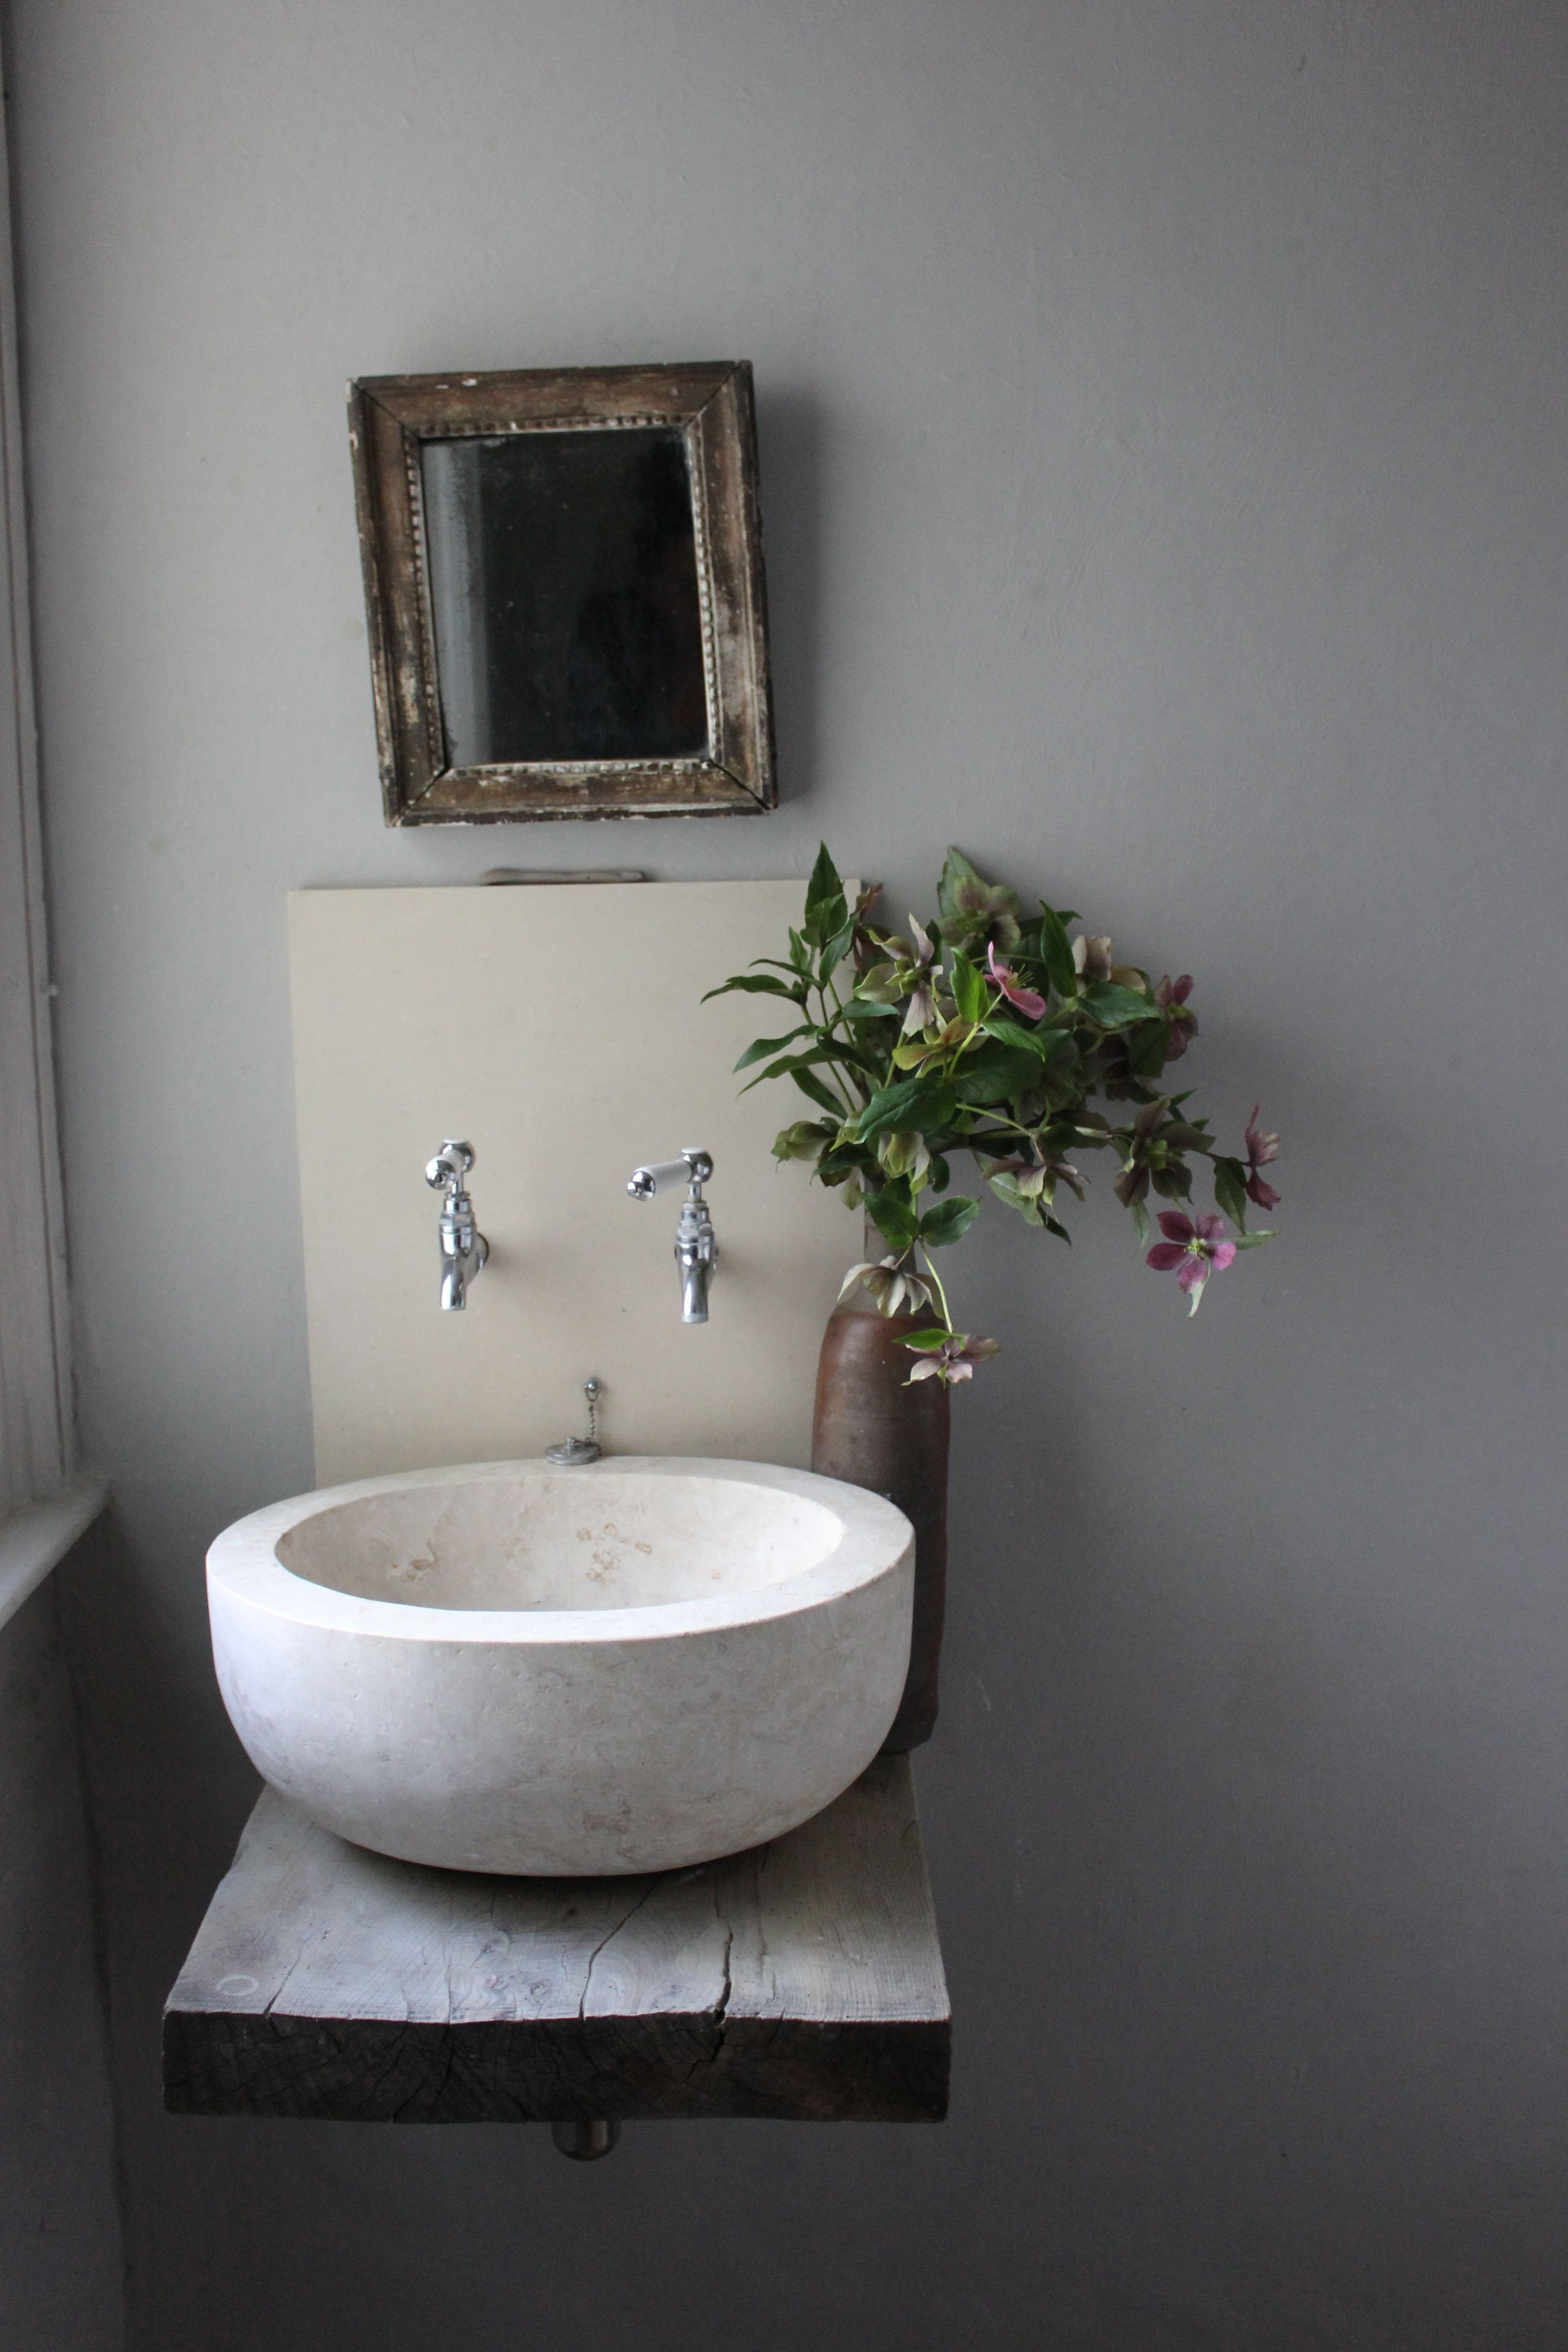 13 Creative Bathroom Sink Ideas You Should Try Modern Bathroom Sink Bathroom Design Small Small Bathroom